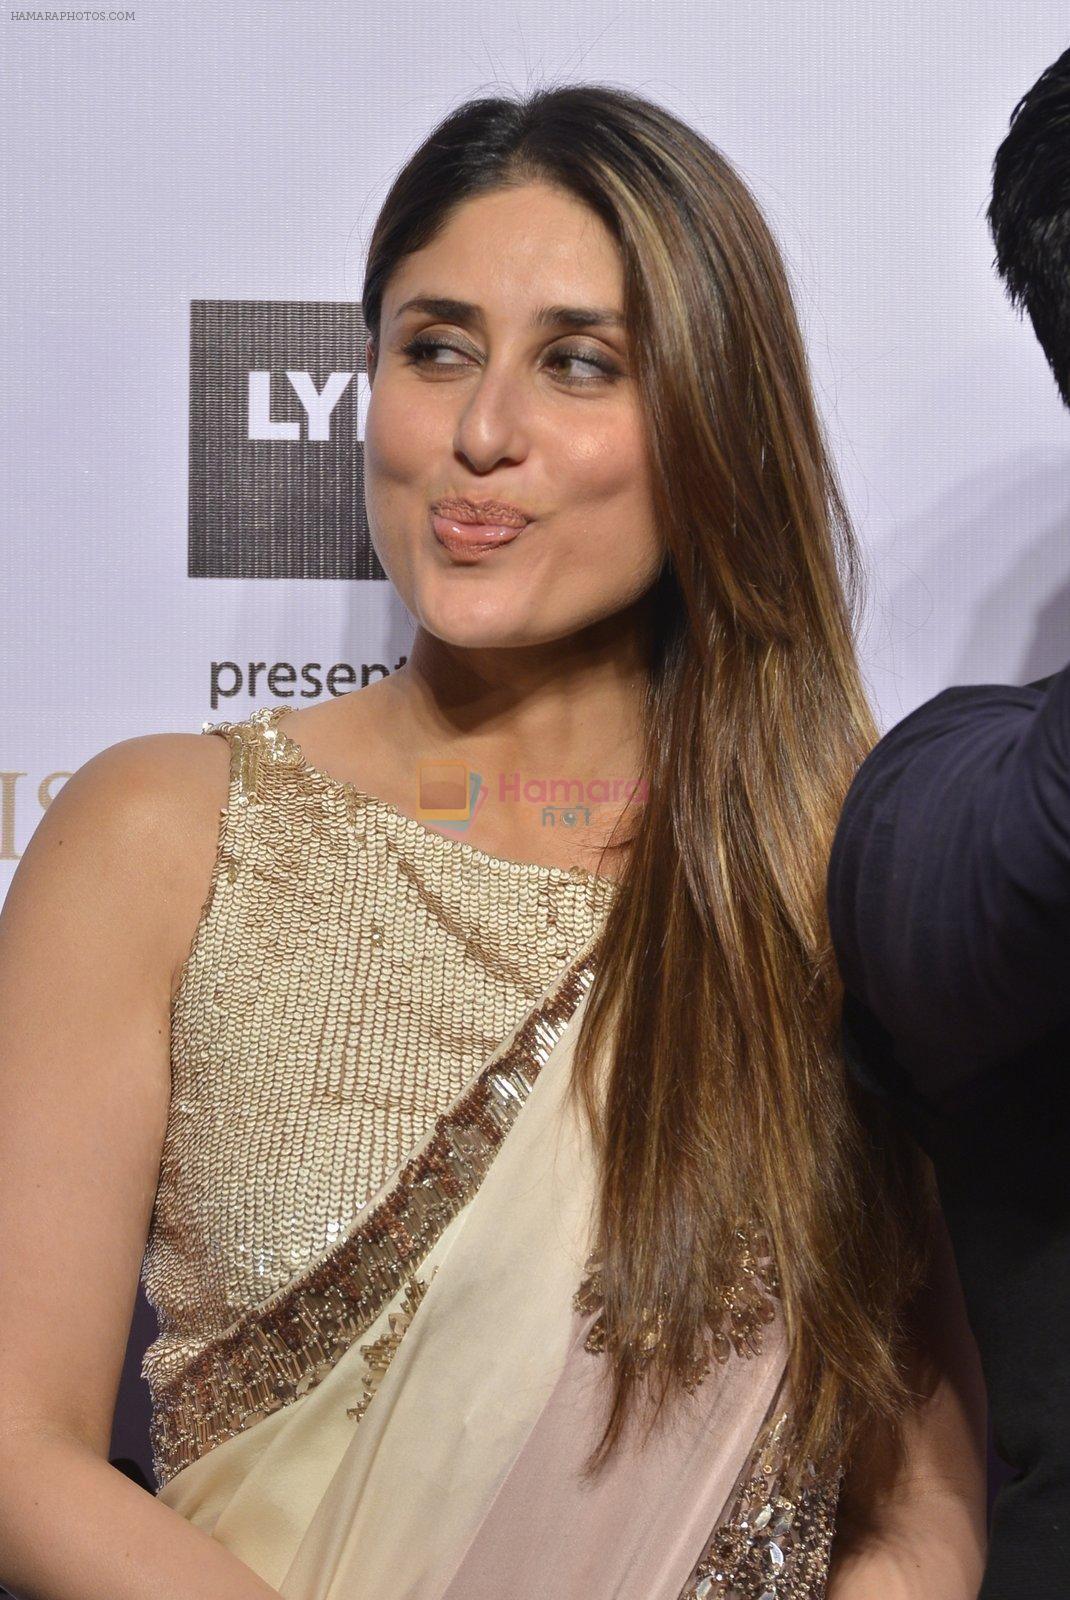 Kareena Kapoor At Lakme Manish Malhotra Show On 29th March 2016 Kareena Kapoor Khan Kareena Kapoor Kareena Kapoor Saree